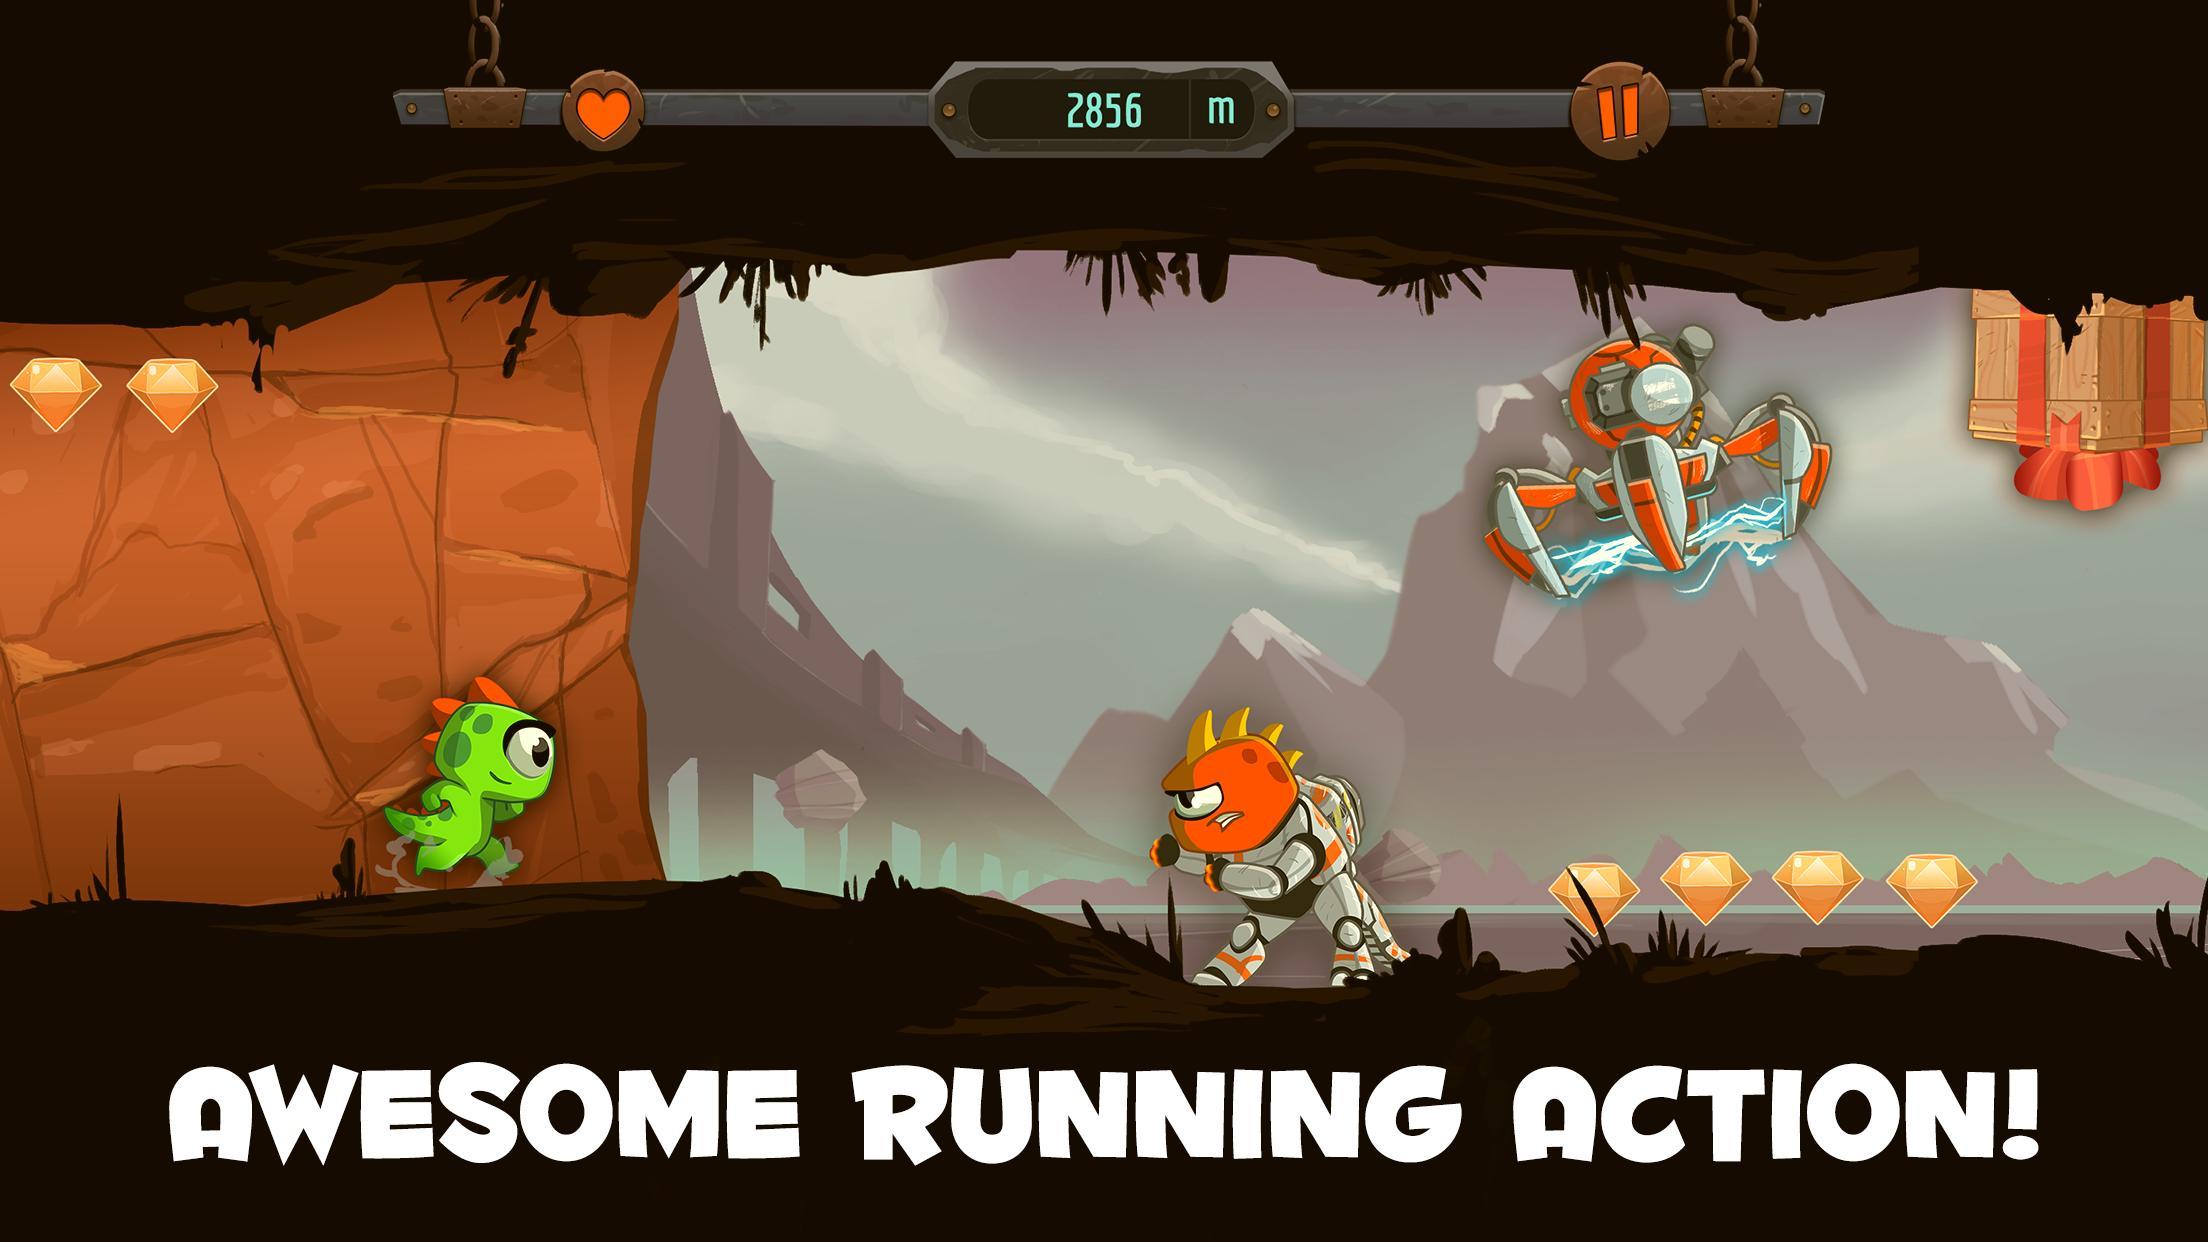 Go Kizi Go Runner By Kizi For Android Apk Download